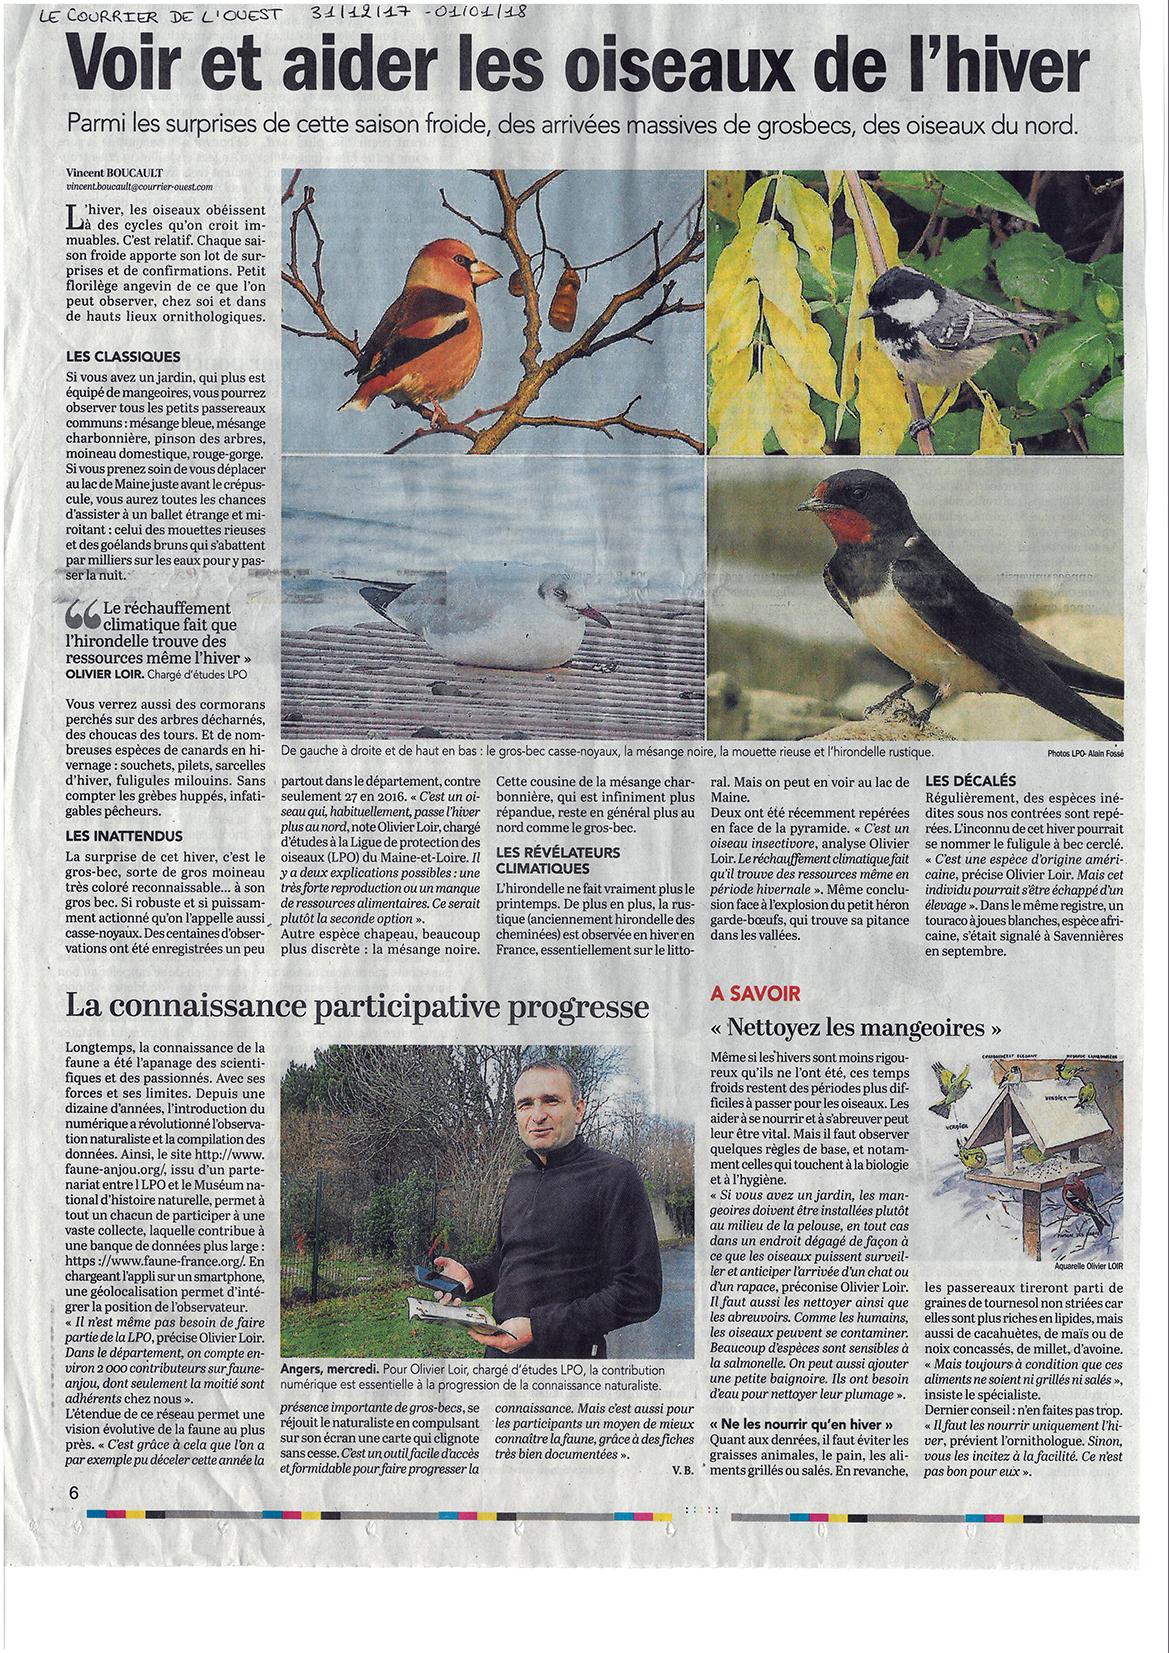 31dec2017 1erjan2018-Courrier de l_O-article